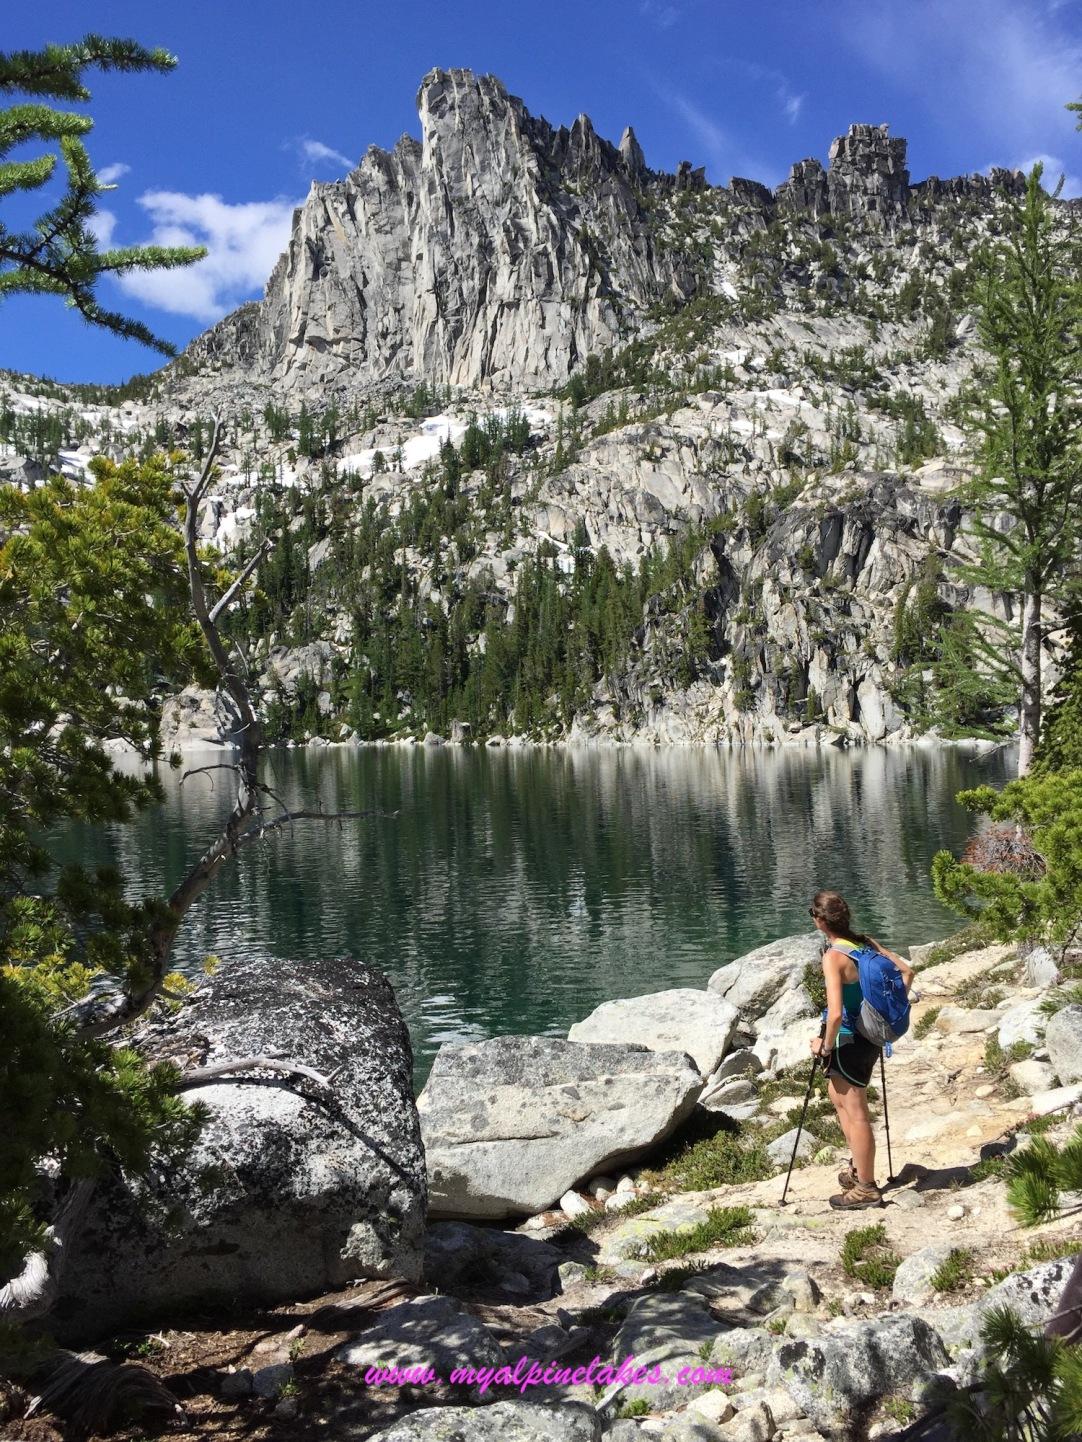 Lake Vivian is Tricia's favorite lake on this hike